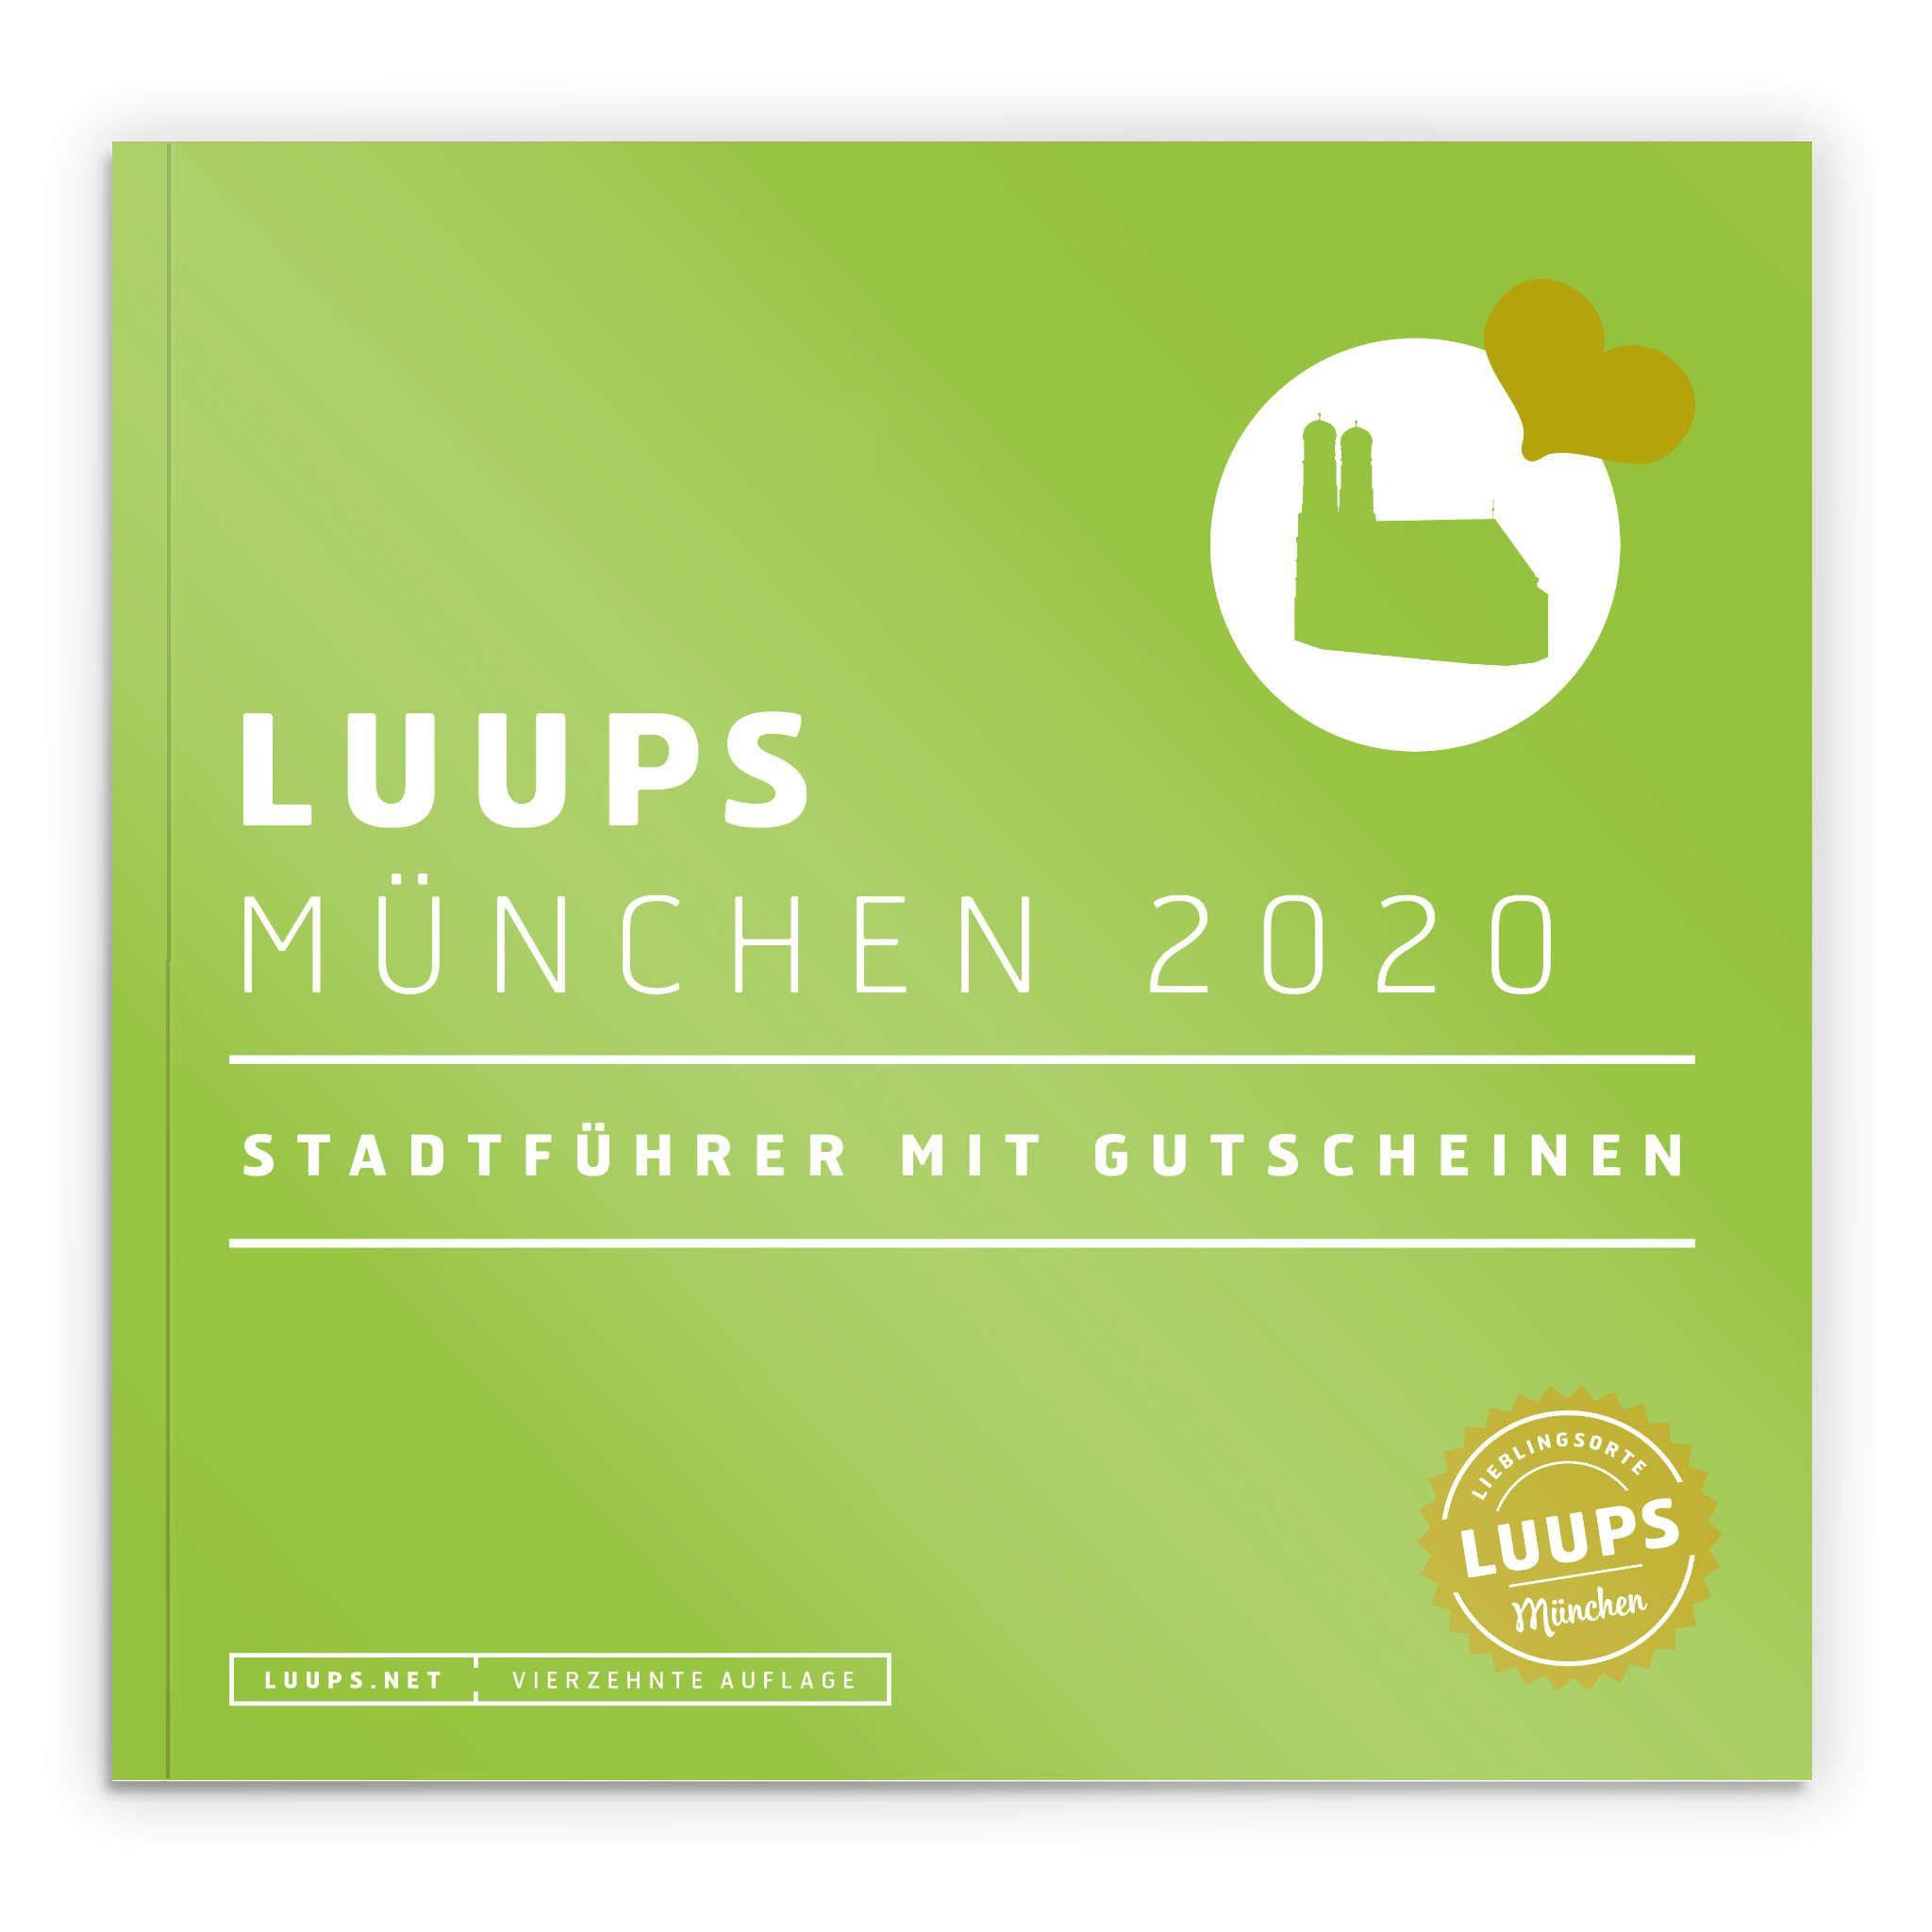 Luups Munchen 2020 Bucher Munchen Online